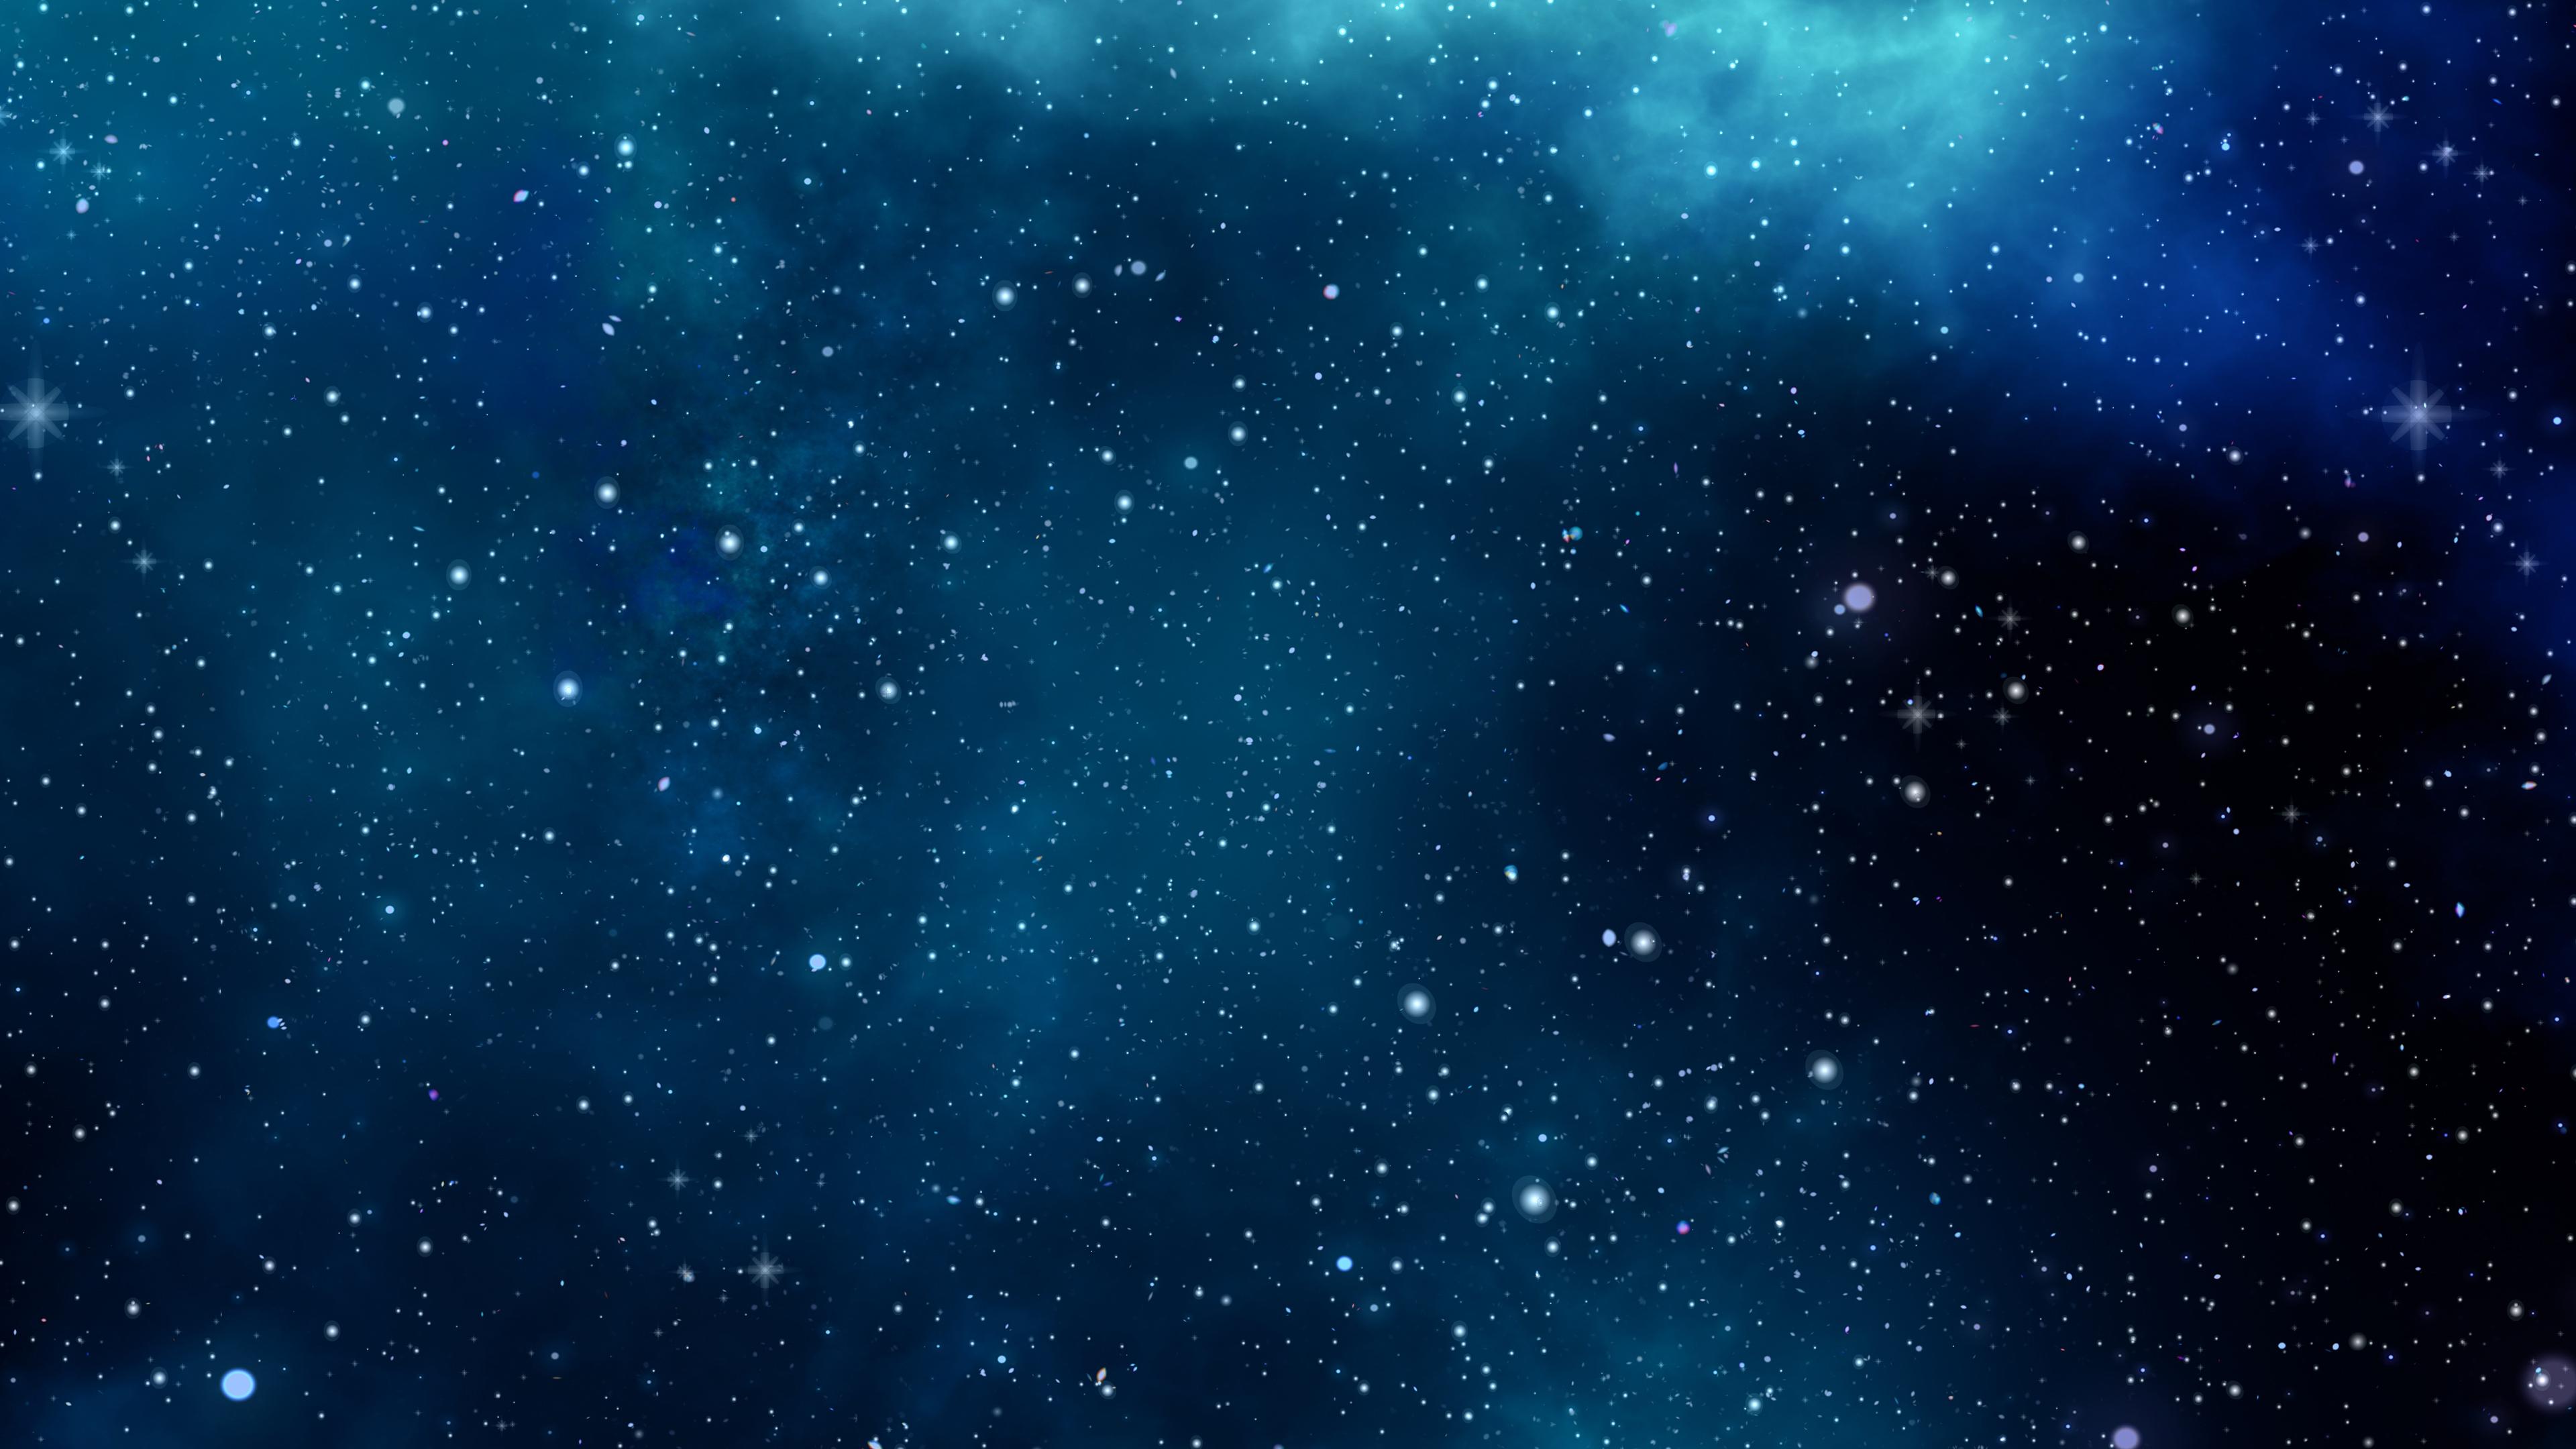 Blue Space Chromebook Wallpaper